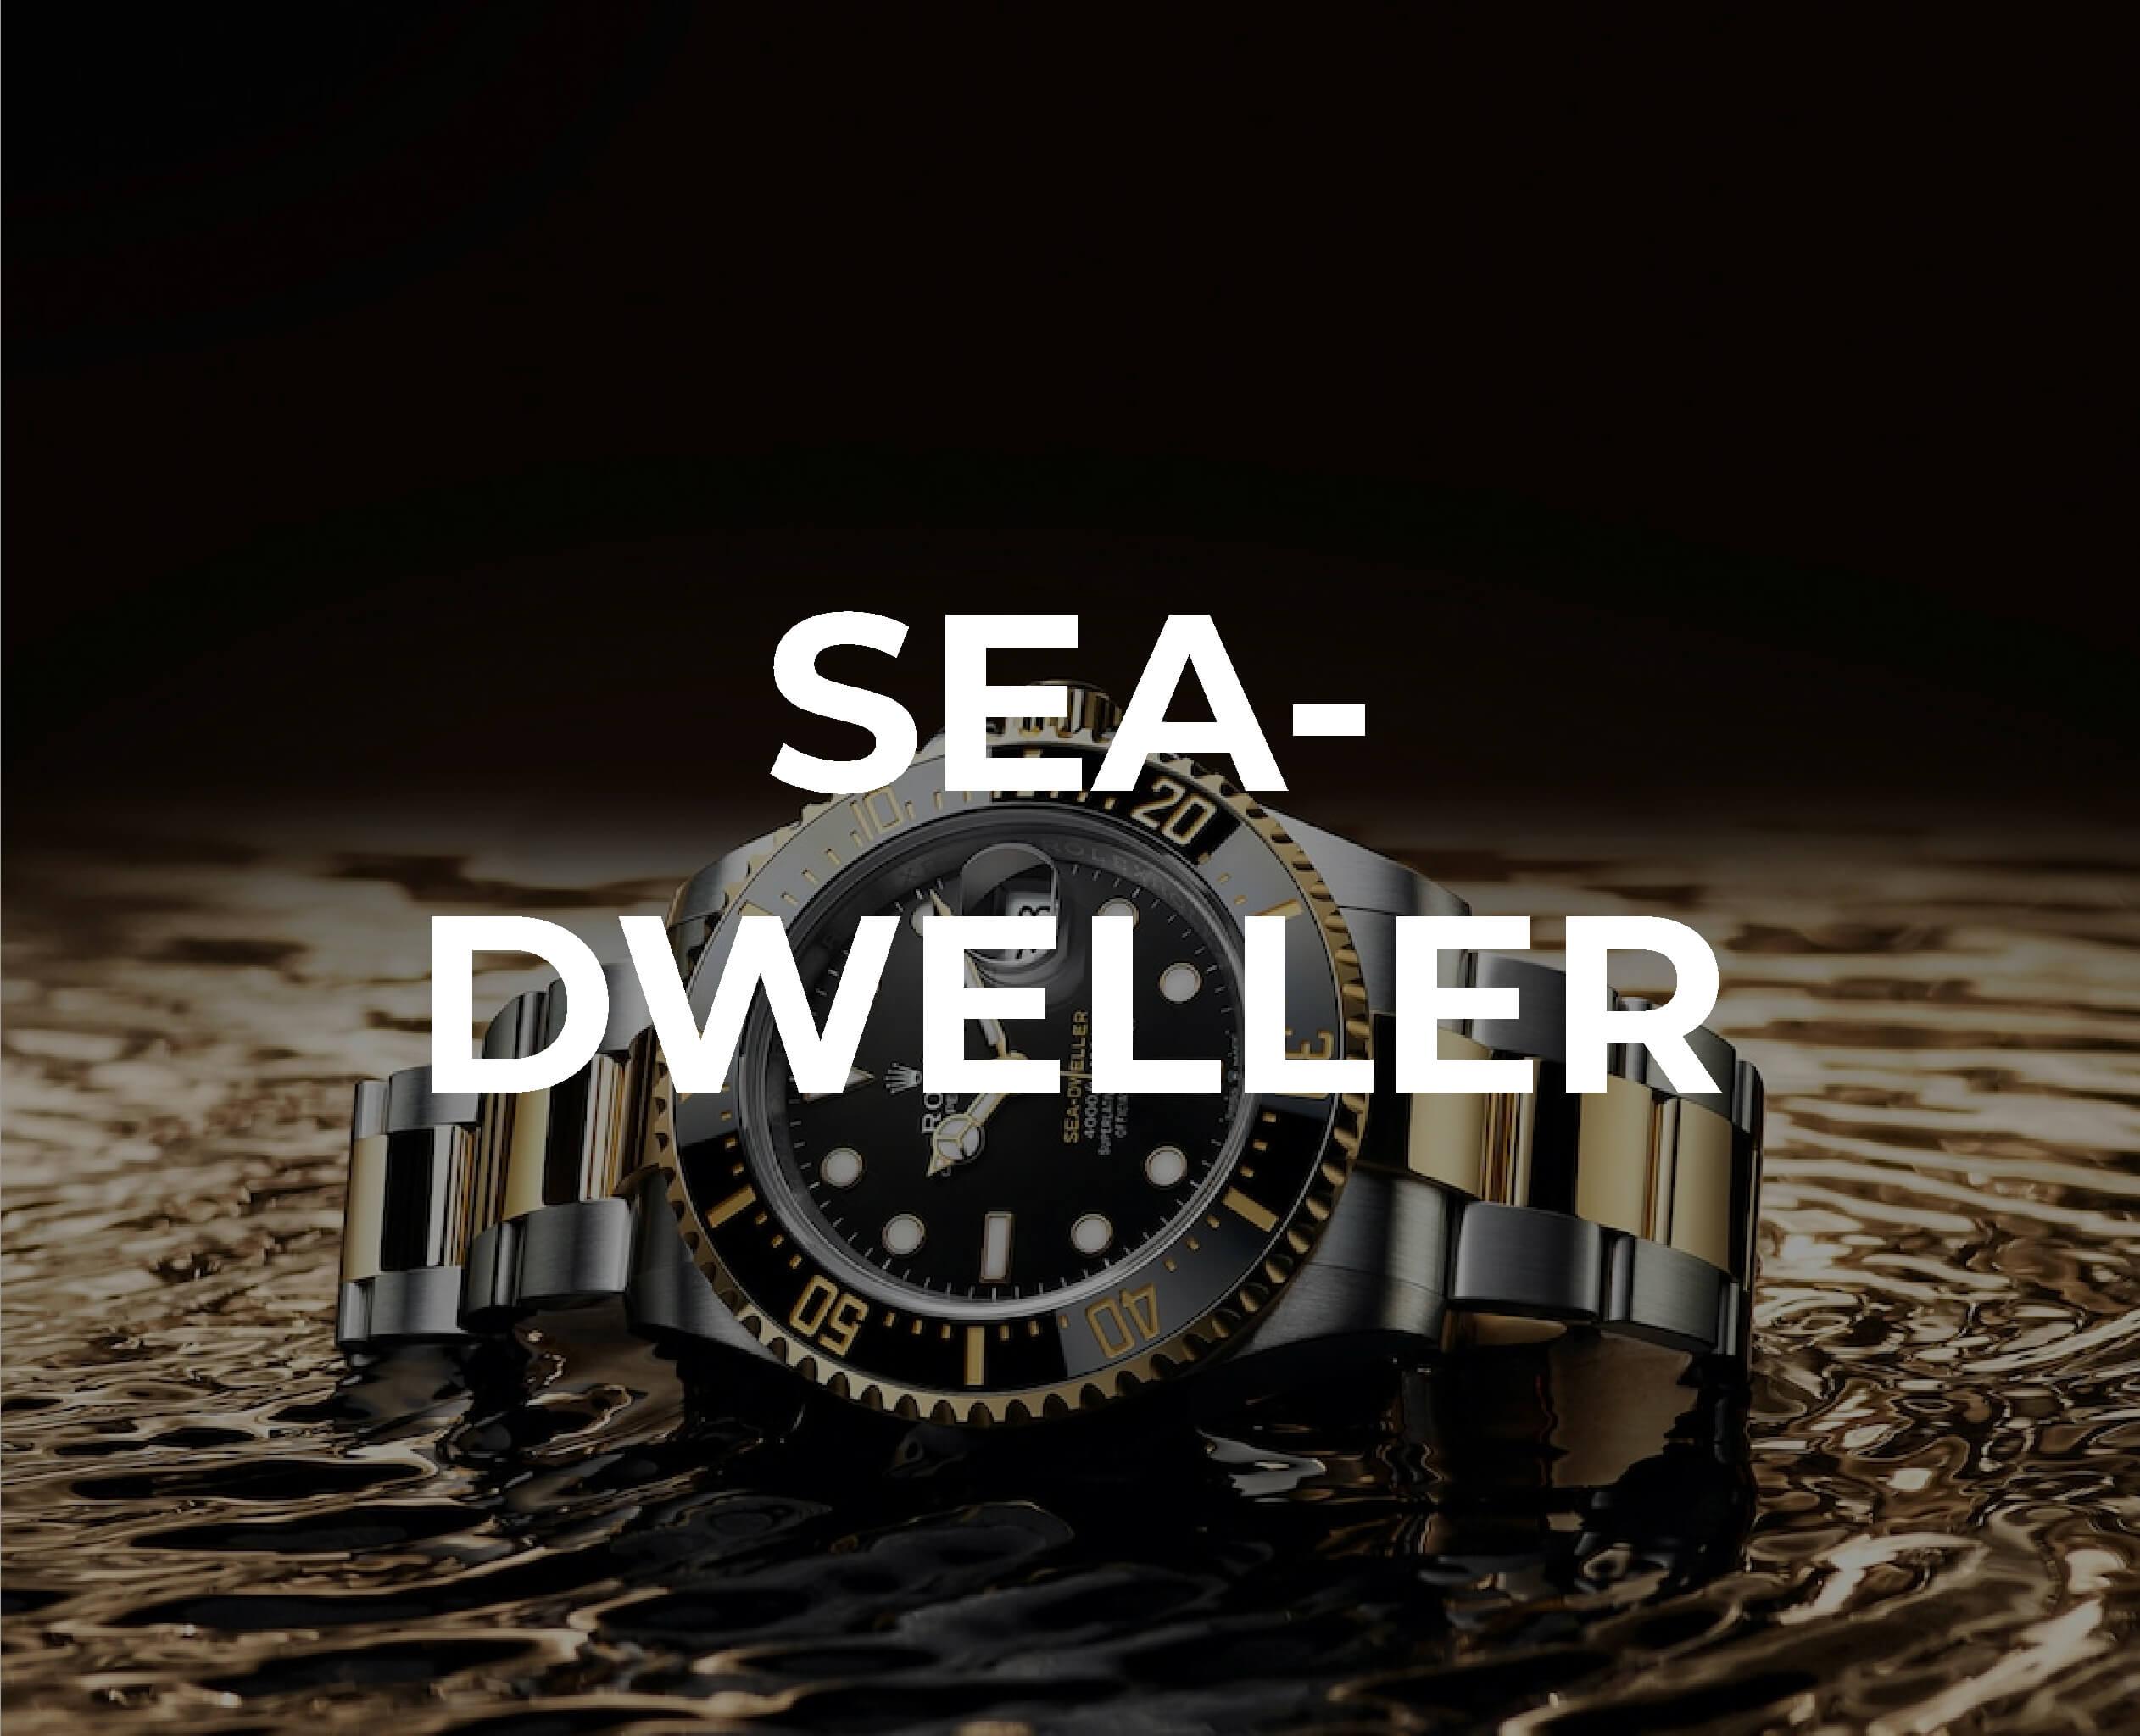 Rolex Sea-Dweller Collection